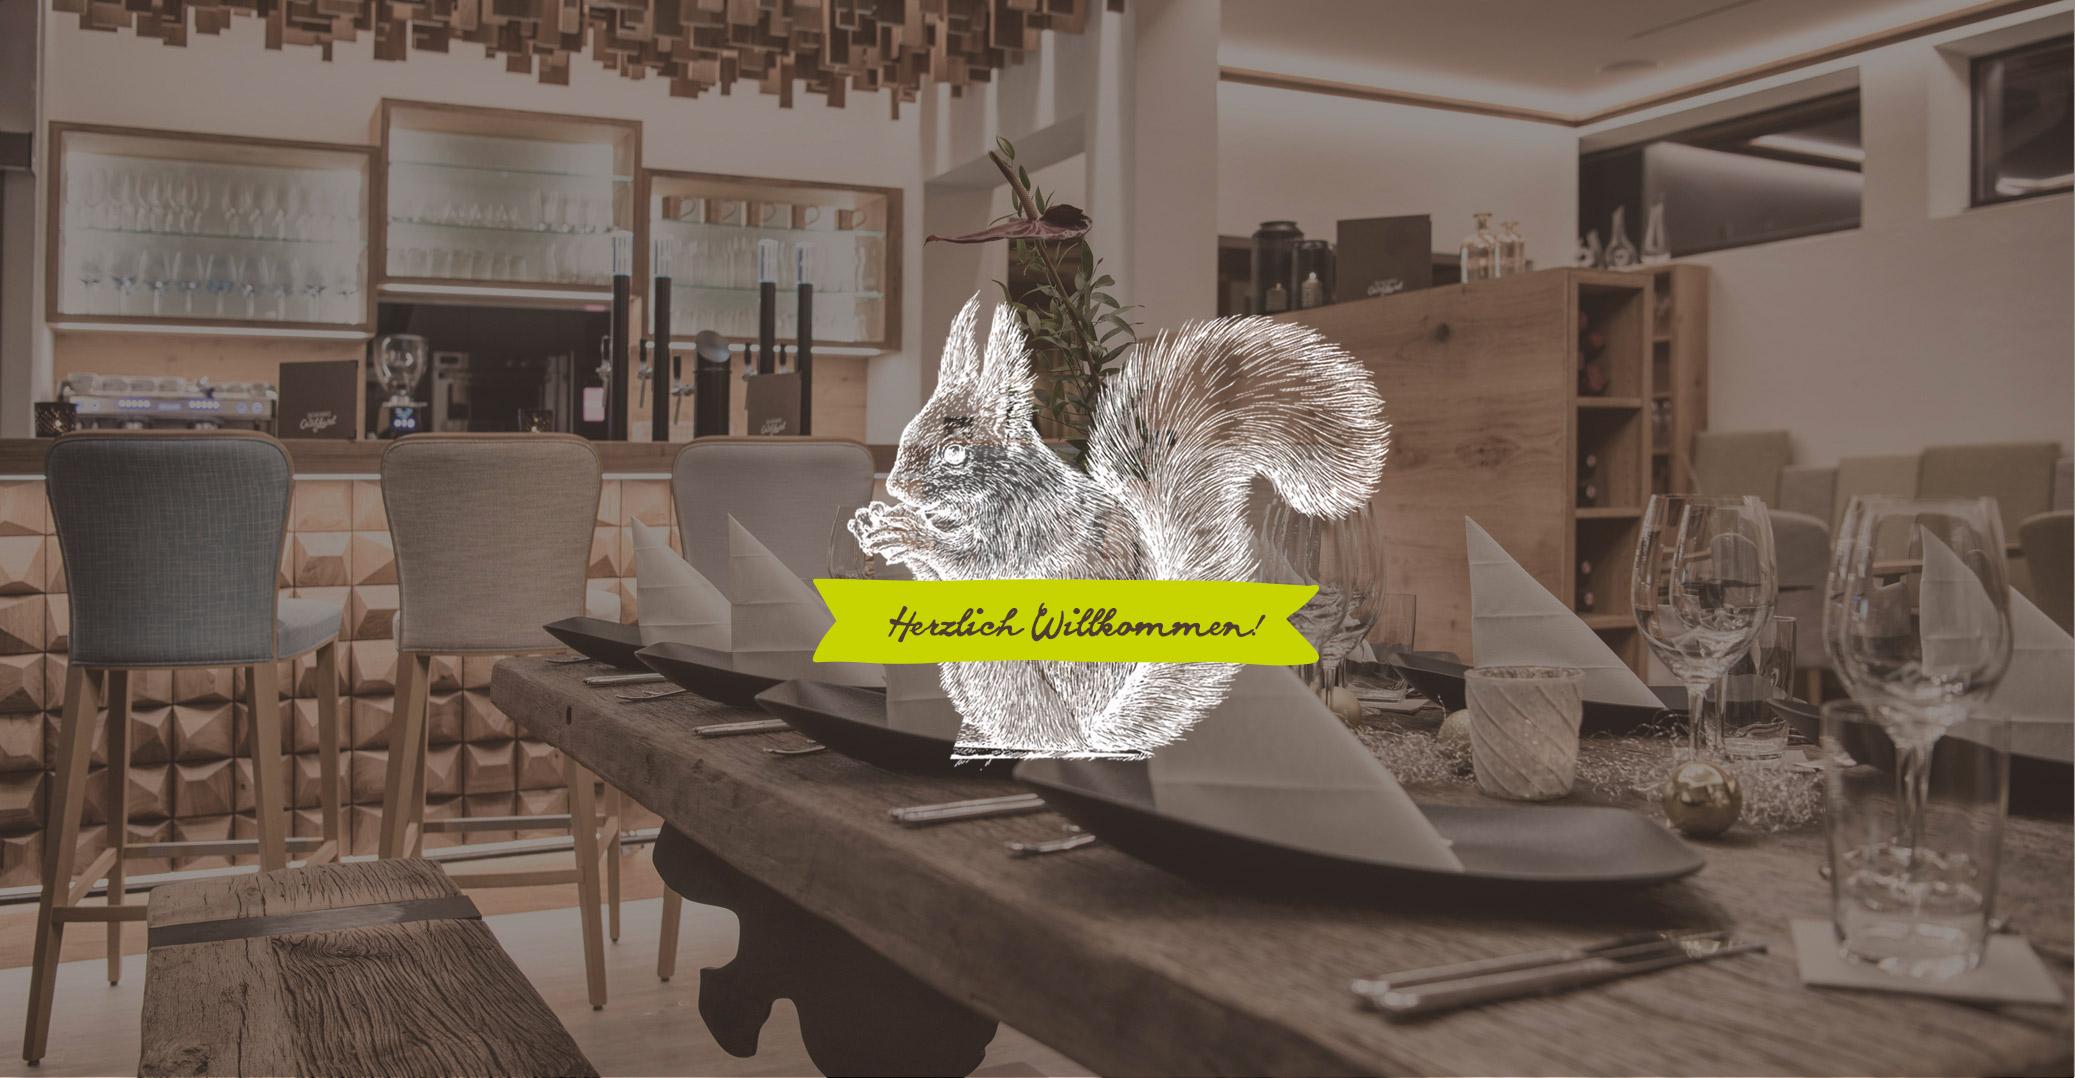 das-oachkatzl-restaurant-in-ellmau